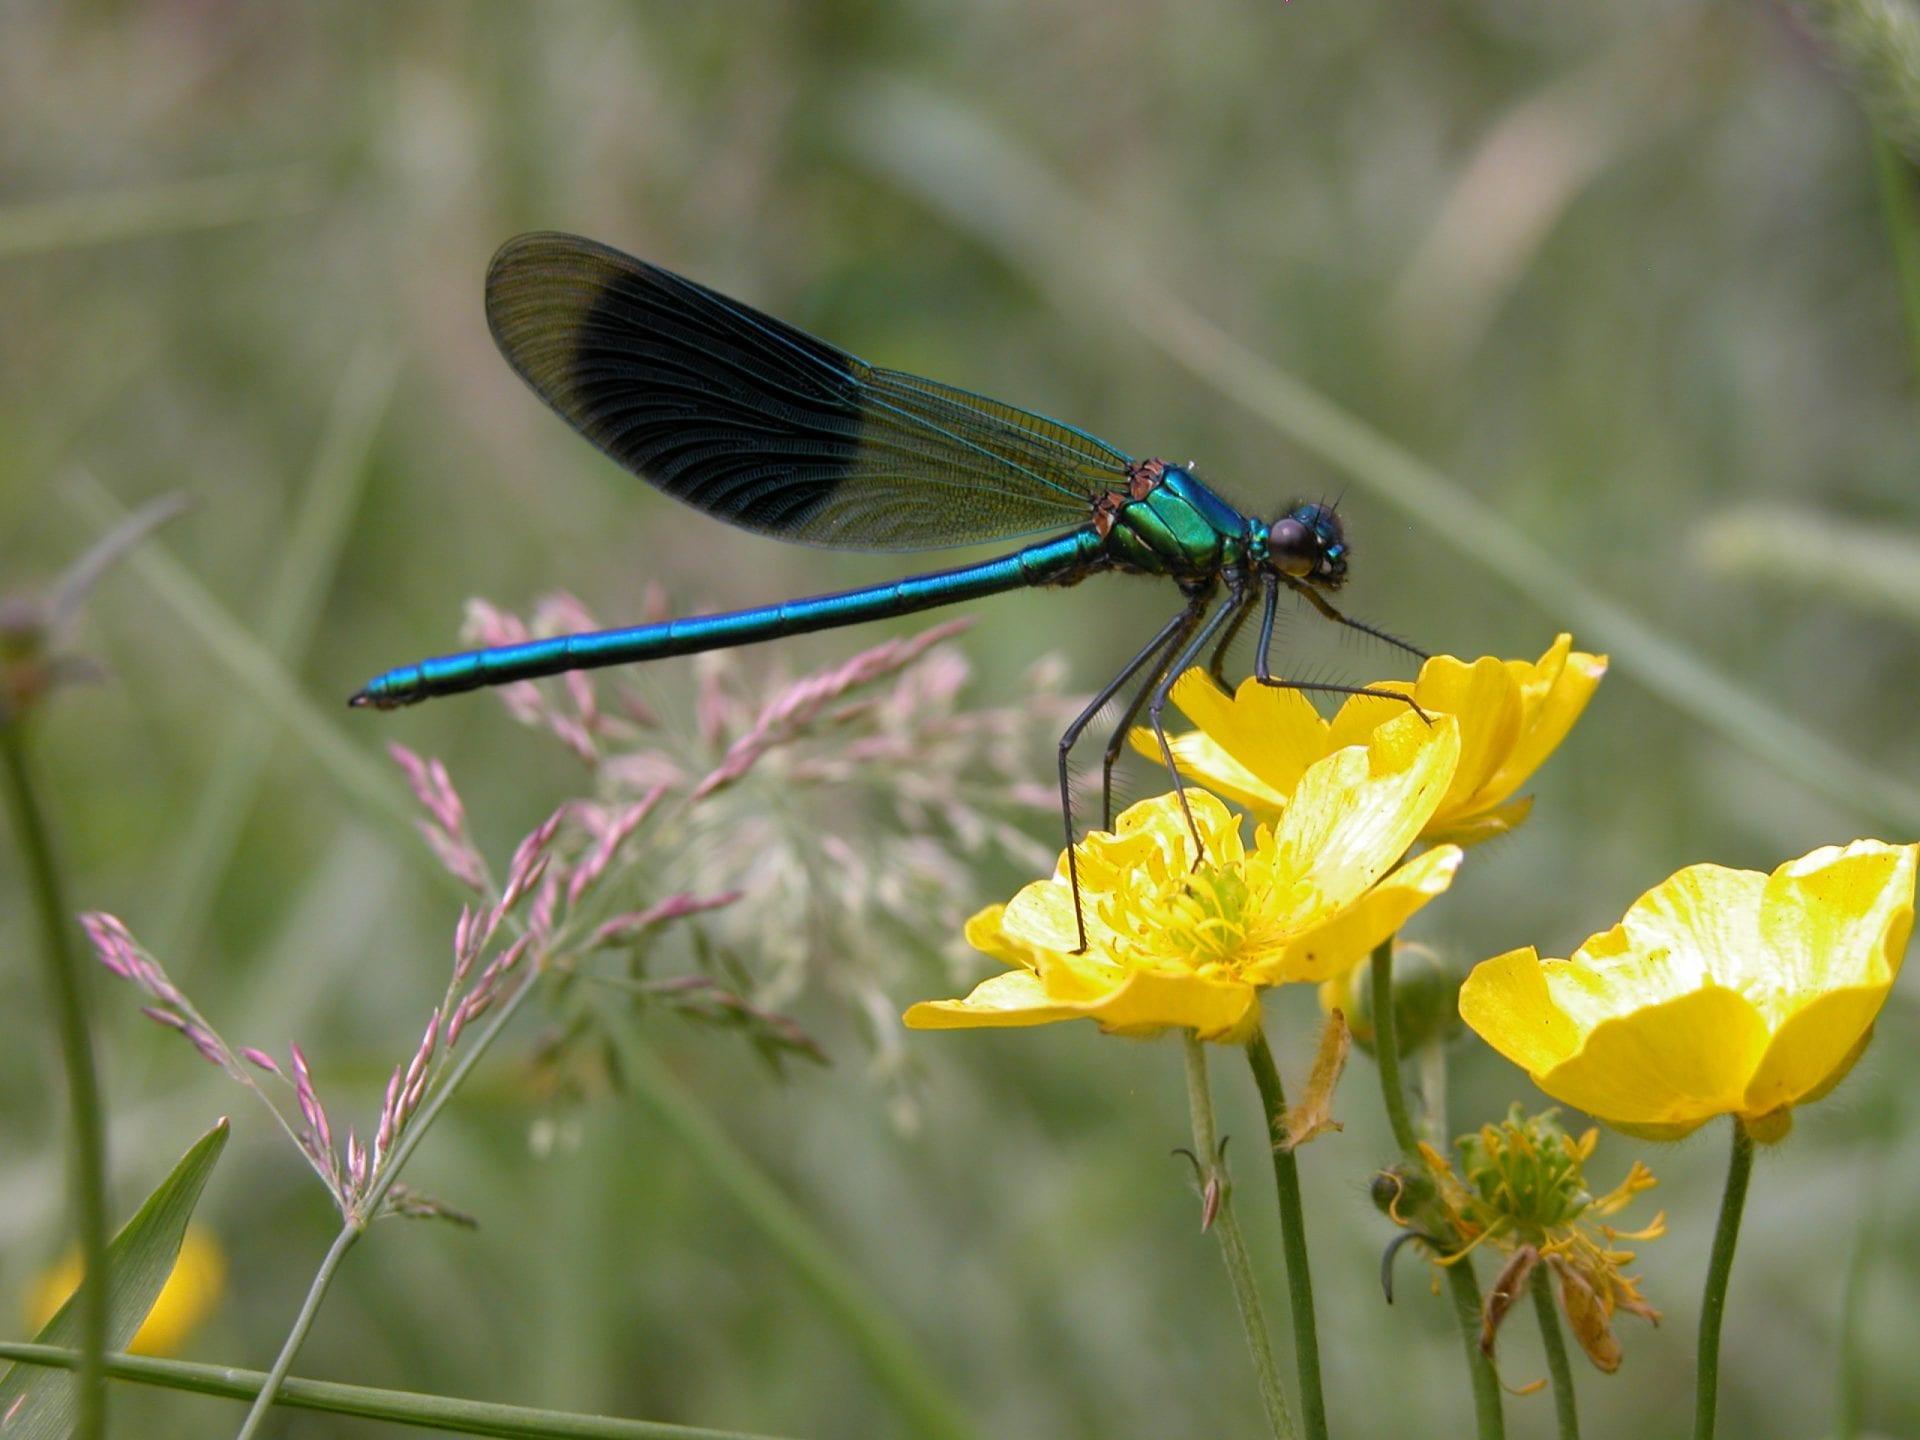 banded-demoiselle-damselfly-on-marsh,marigold